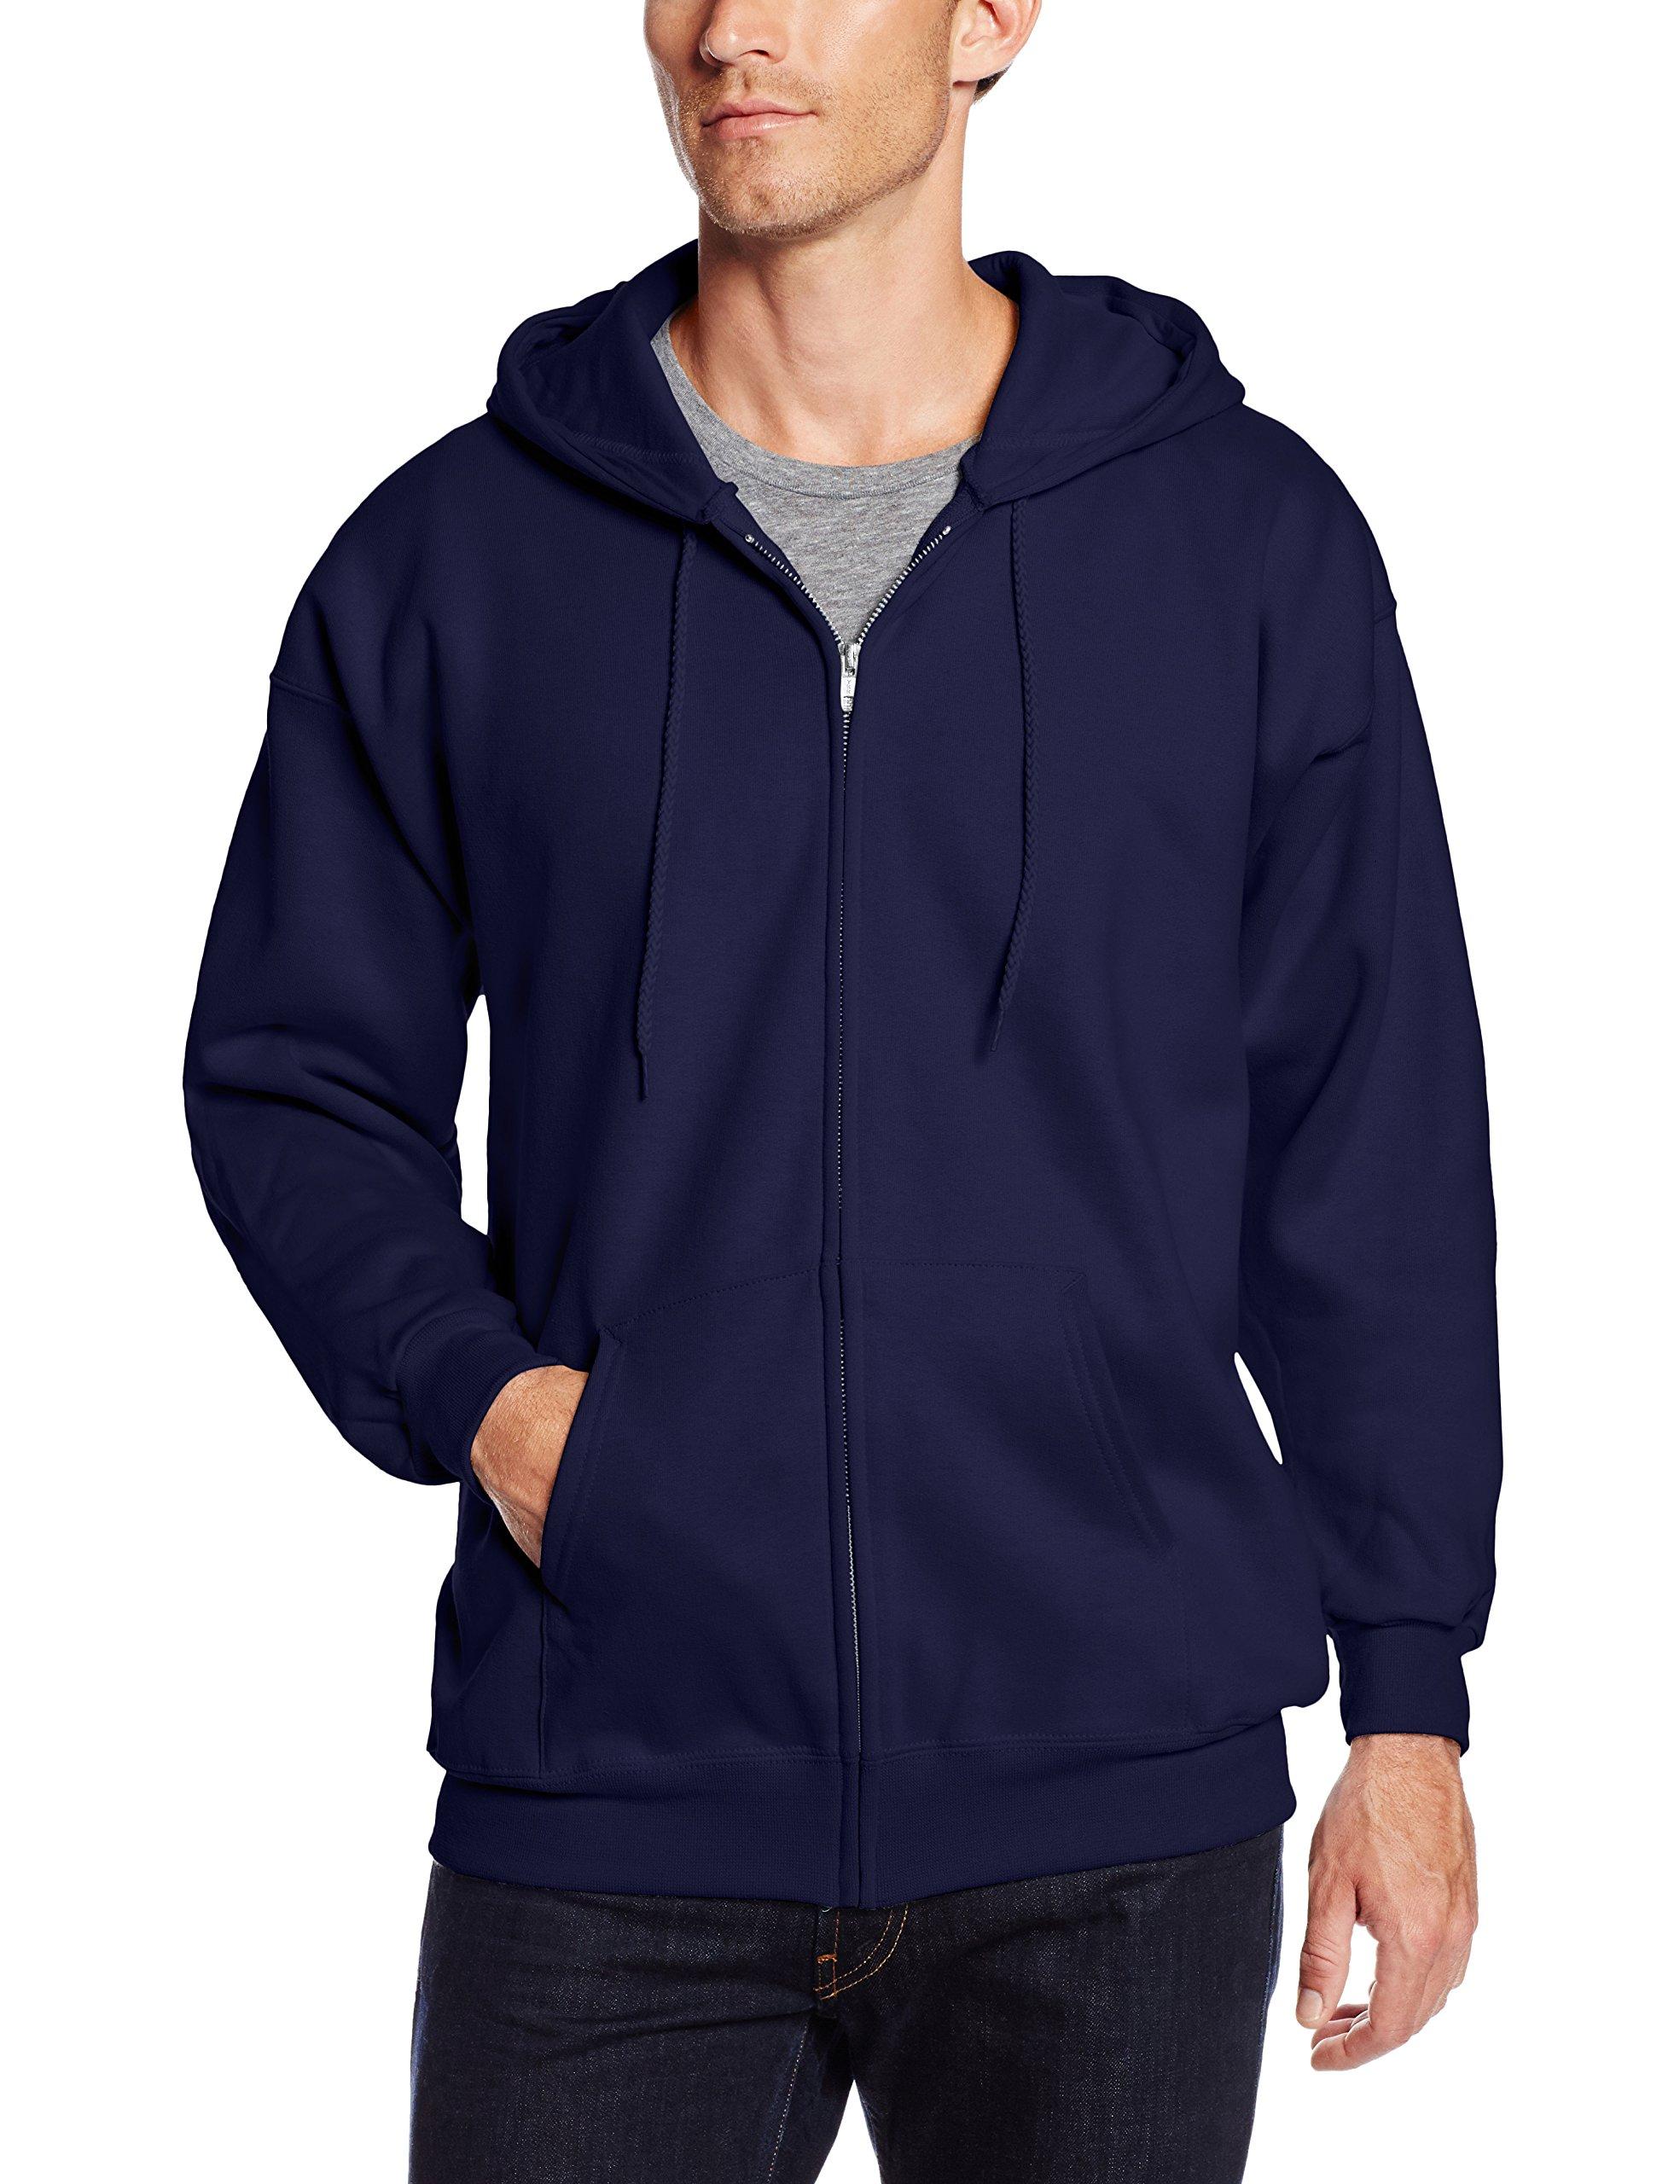 Navy Blue Hoodie: Amazon.com